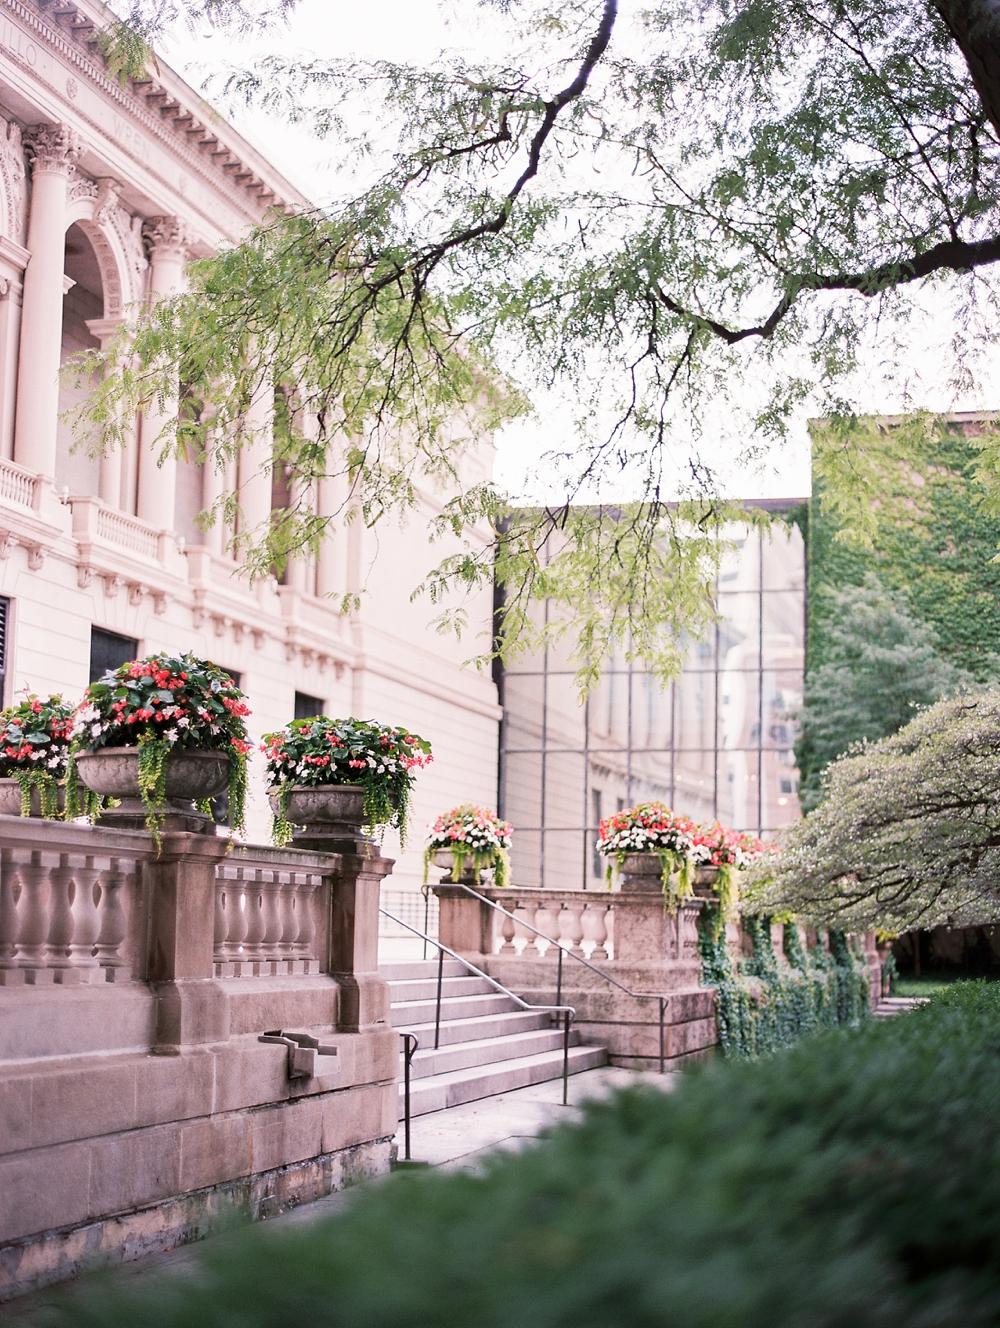 Kristin-La-Voie-Photography-Chicago-Wedding-Photographer-Art-Institute-Fine-Art-Film-Top-Photographer-62